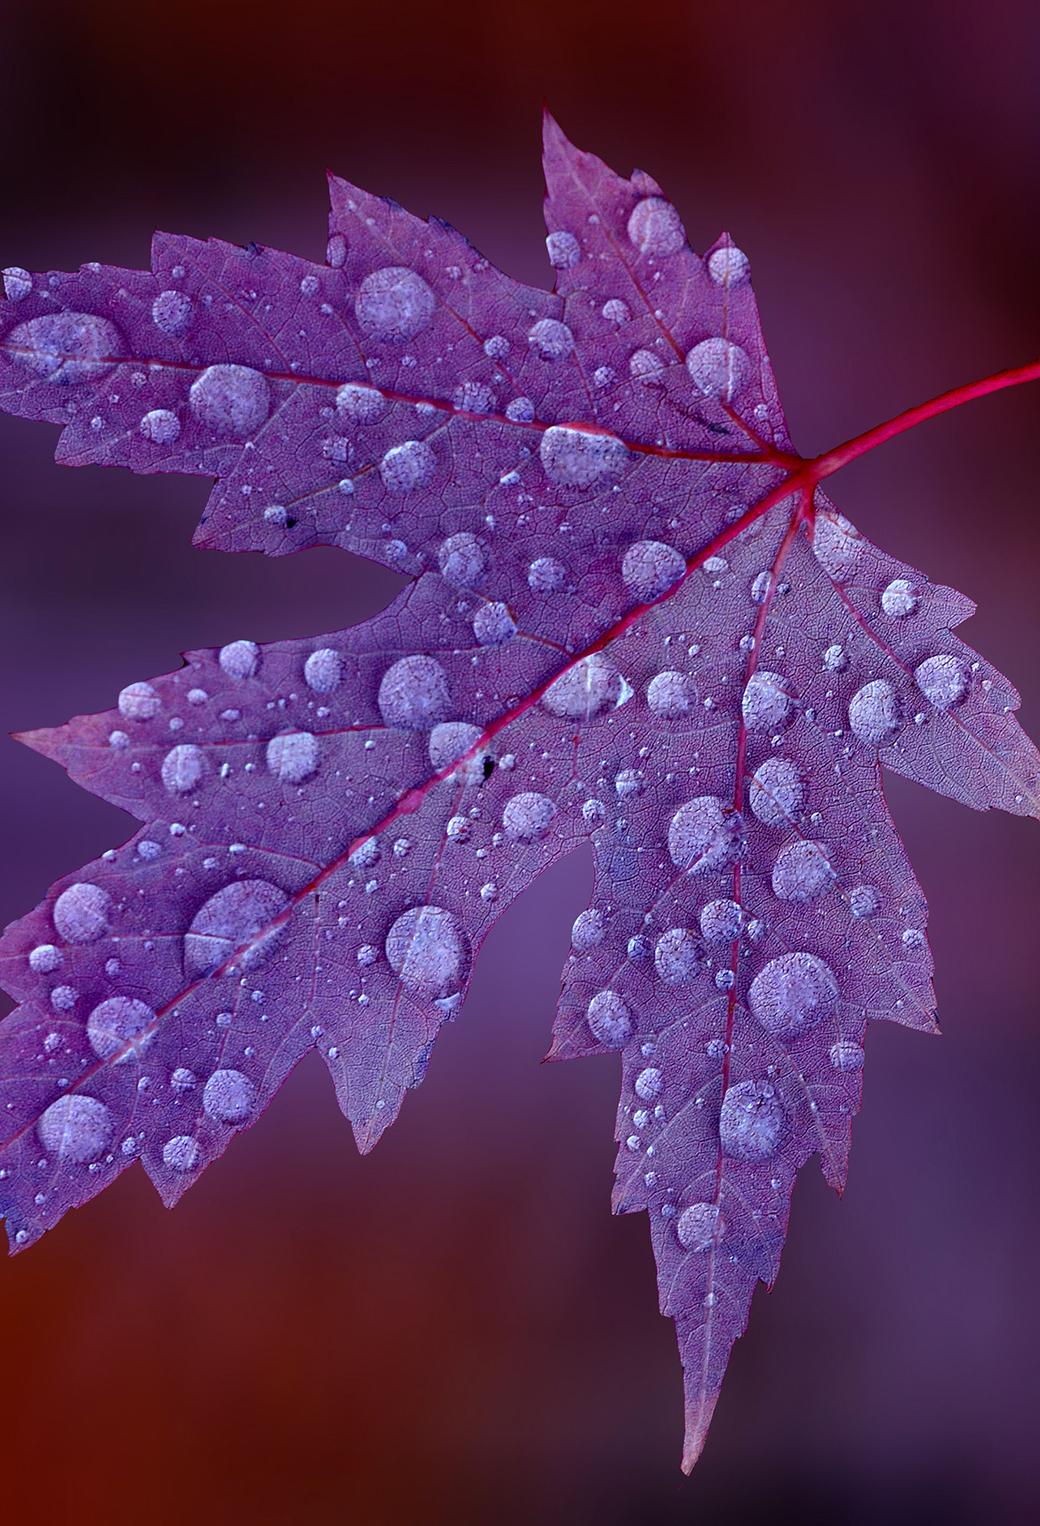 Purple Drops 3Wallpapers iPhone Parallax Purple Drops